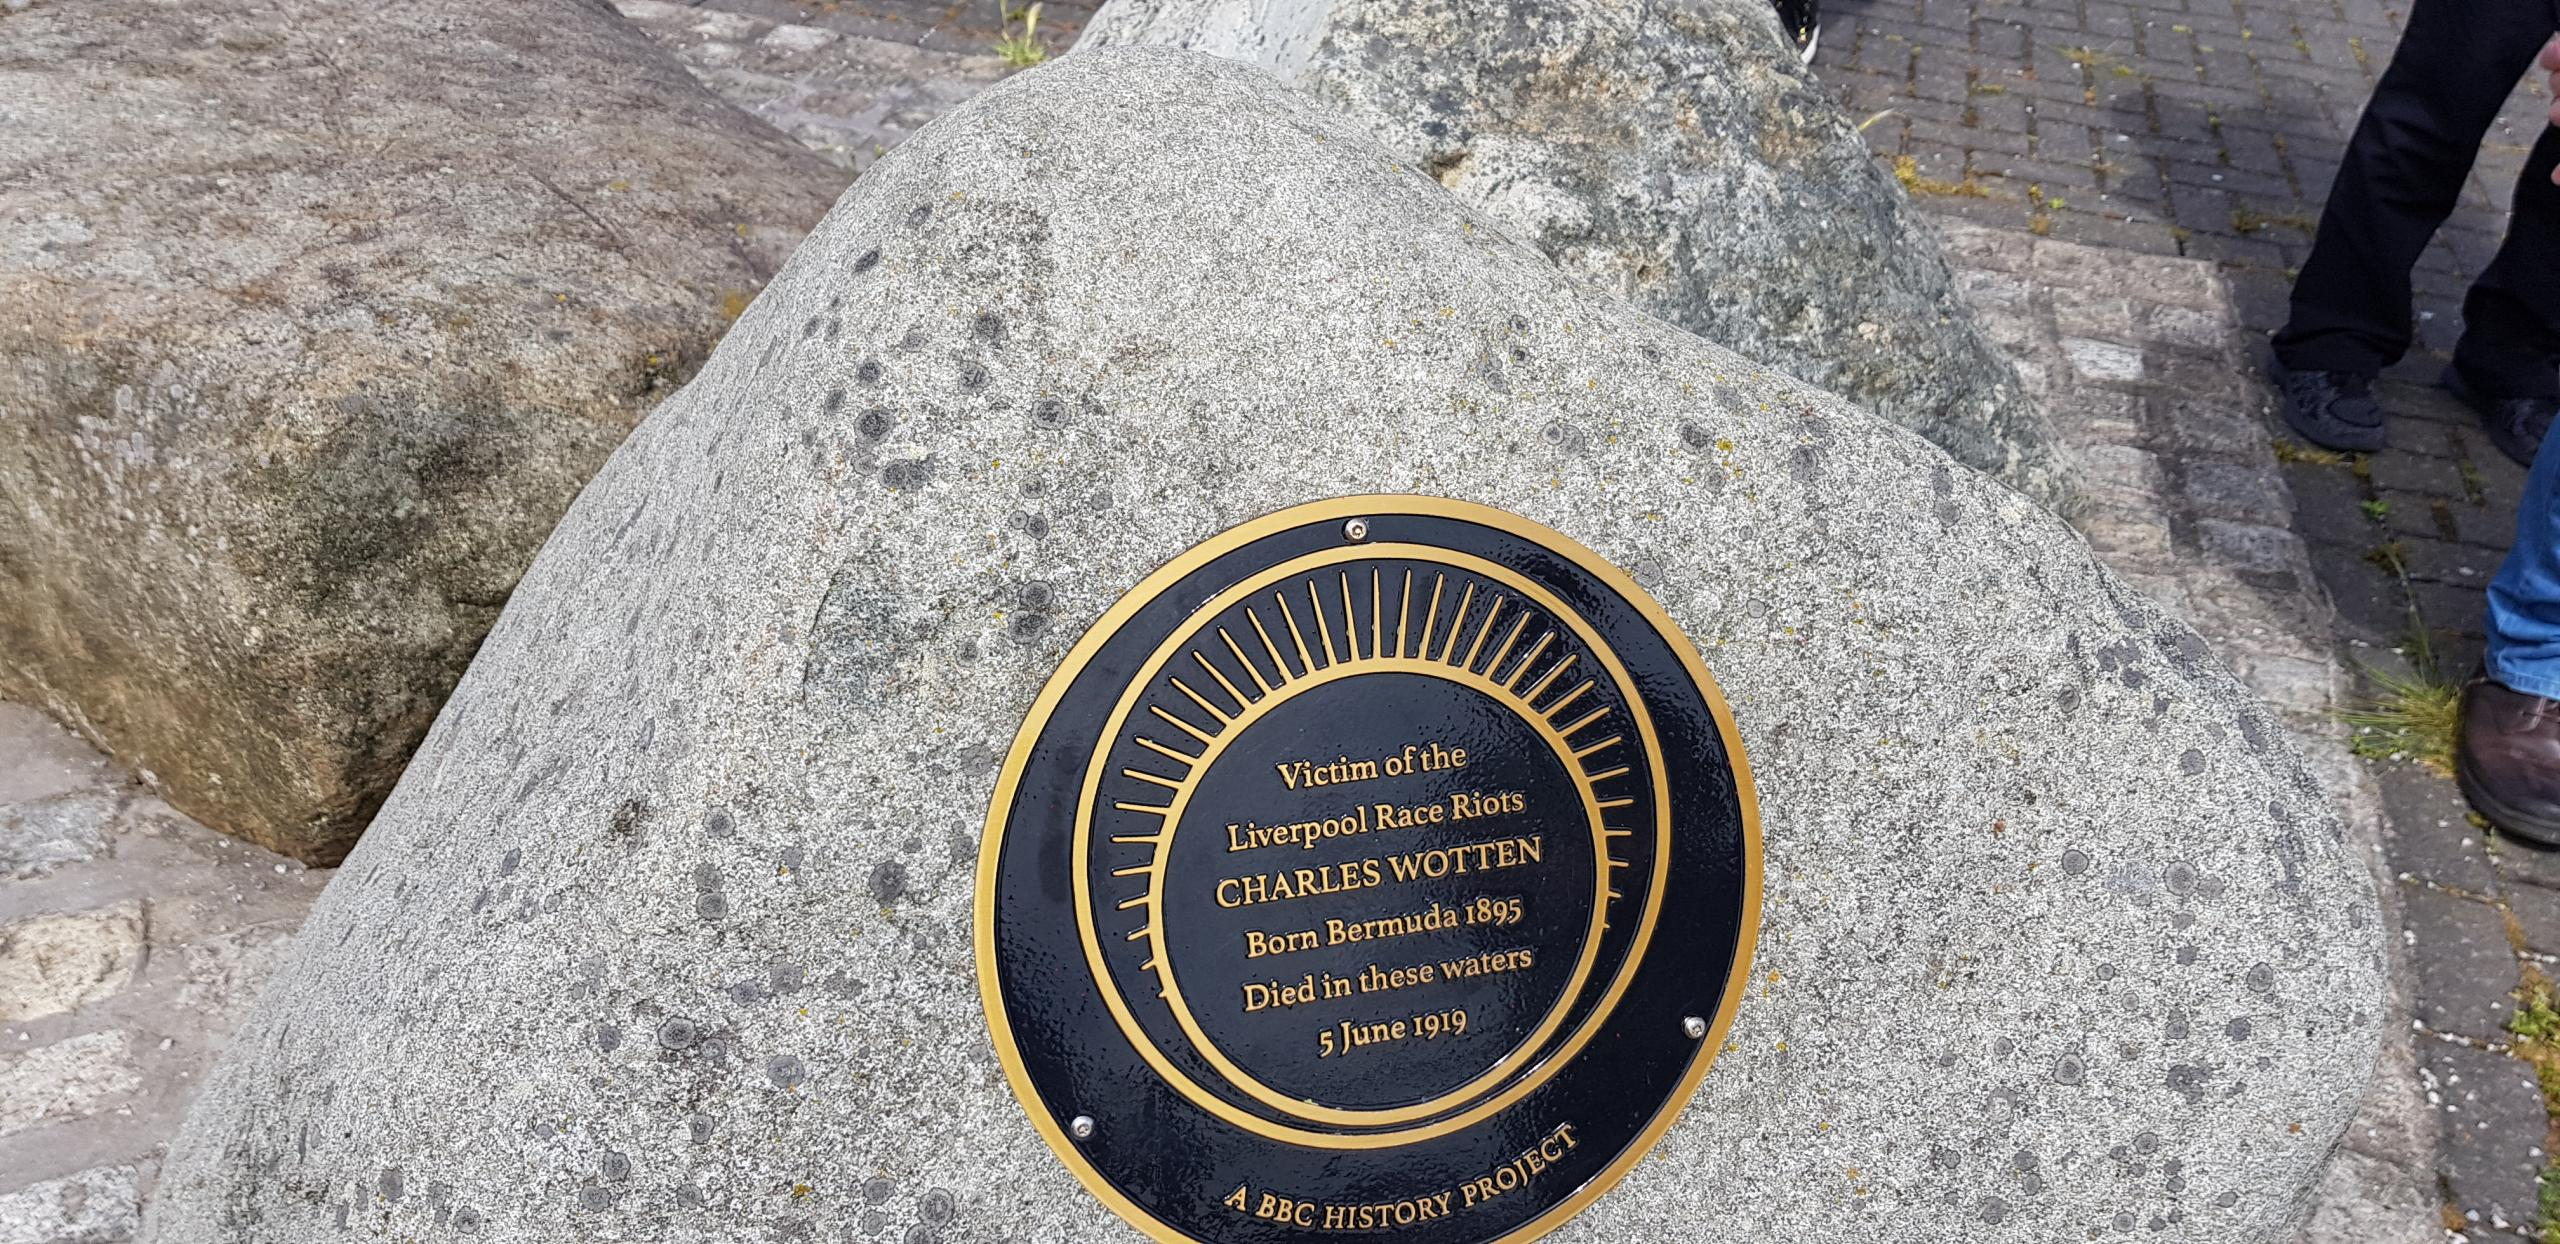 Charles Wotten memorial